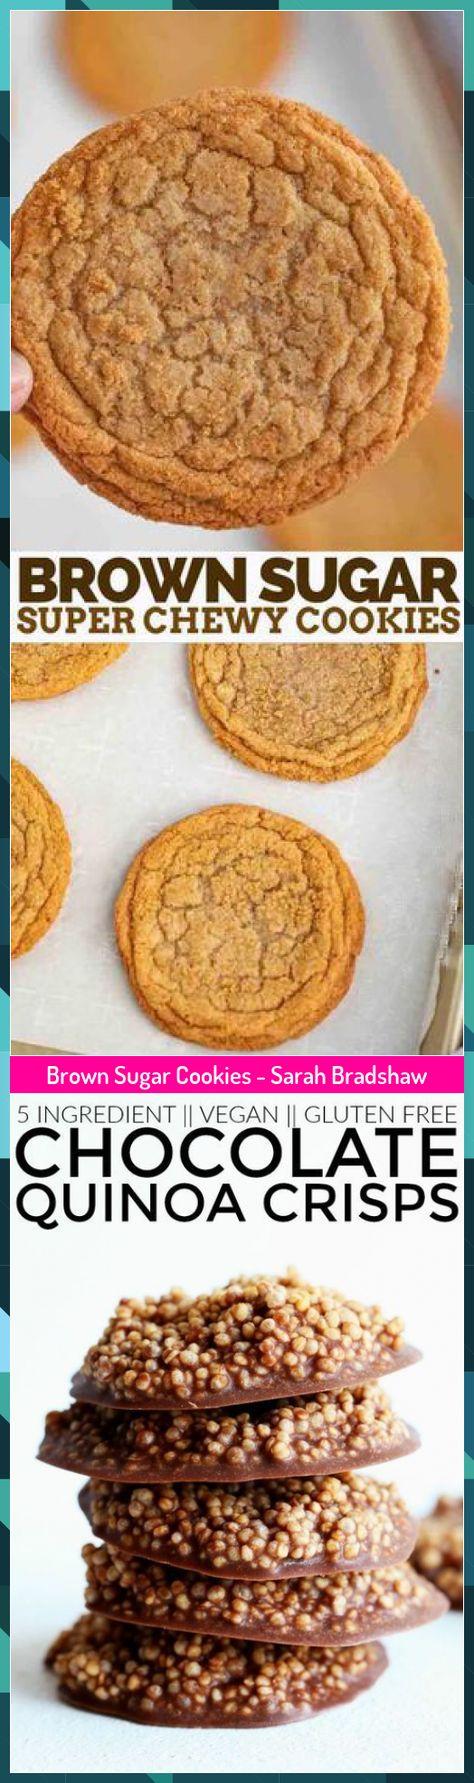 Brown Sugar Cookies - Sarah Bradshaw #Bradshaw #Brown #Cookies #Sarah #Sugar